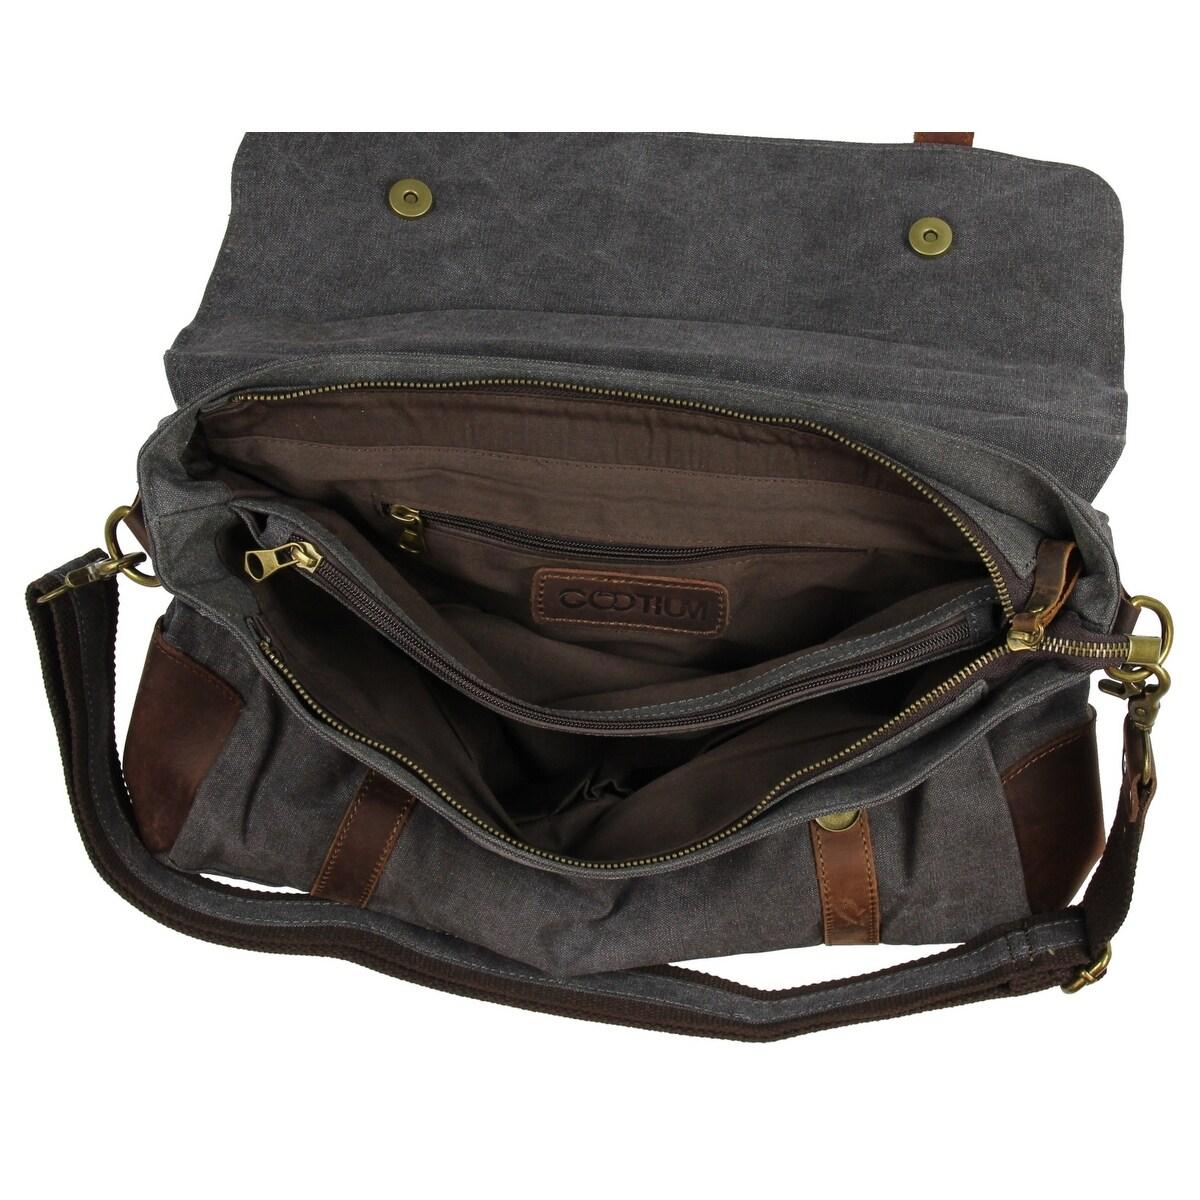 1374f7840a Shop Gootium Canvas Leather Messenger Bag Vintage Shoulder Bag 14-Inch  Laptop Briefcase